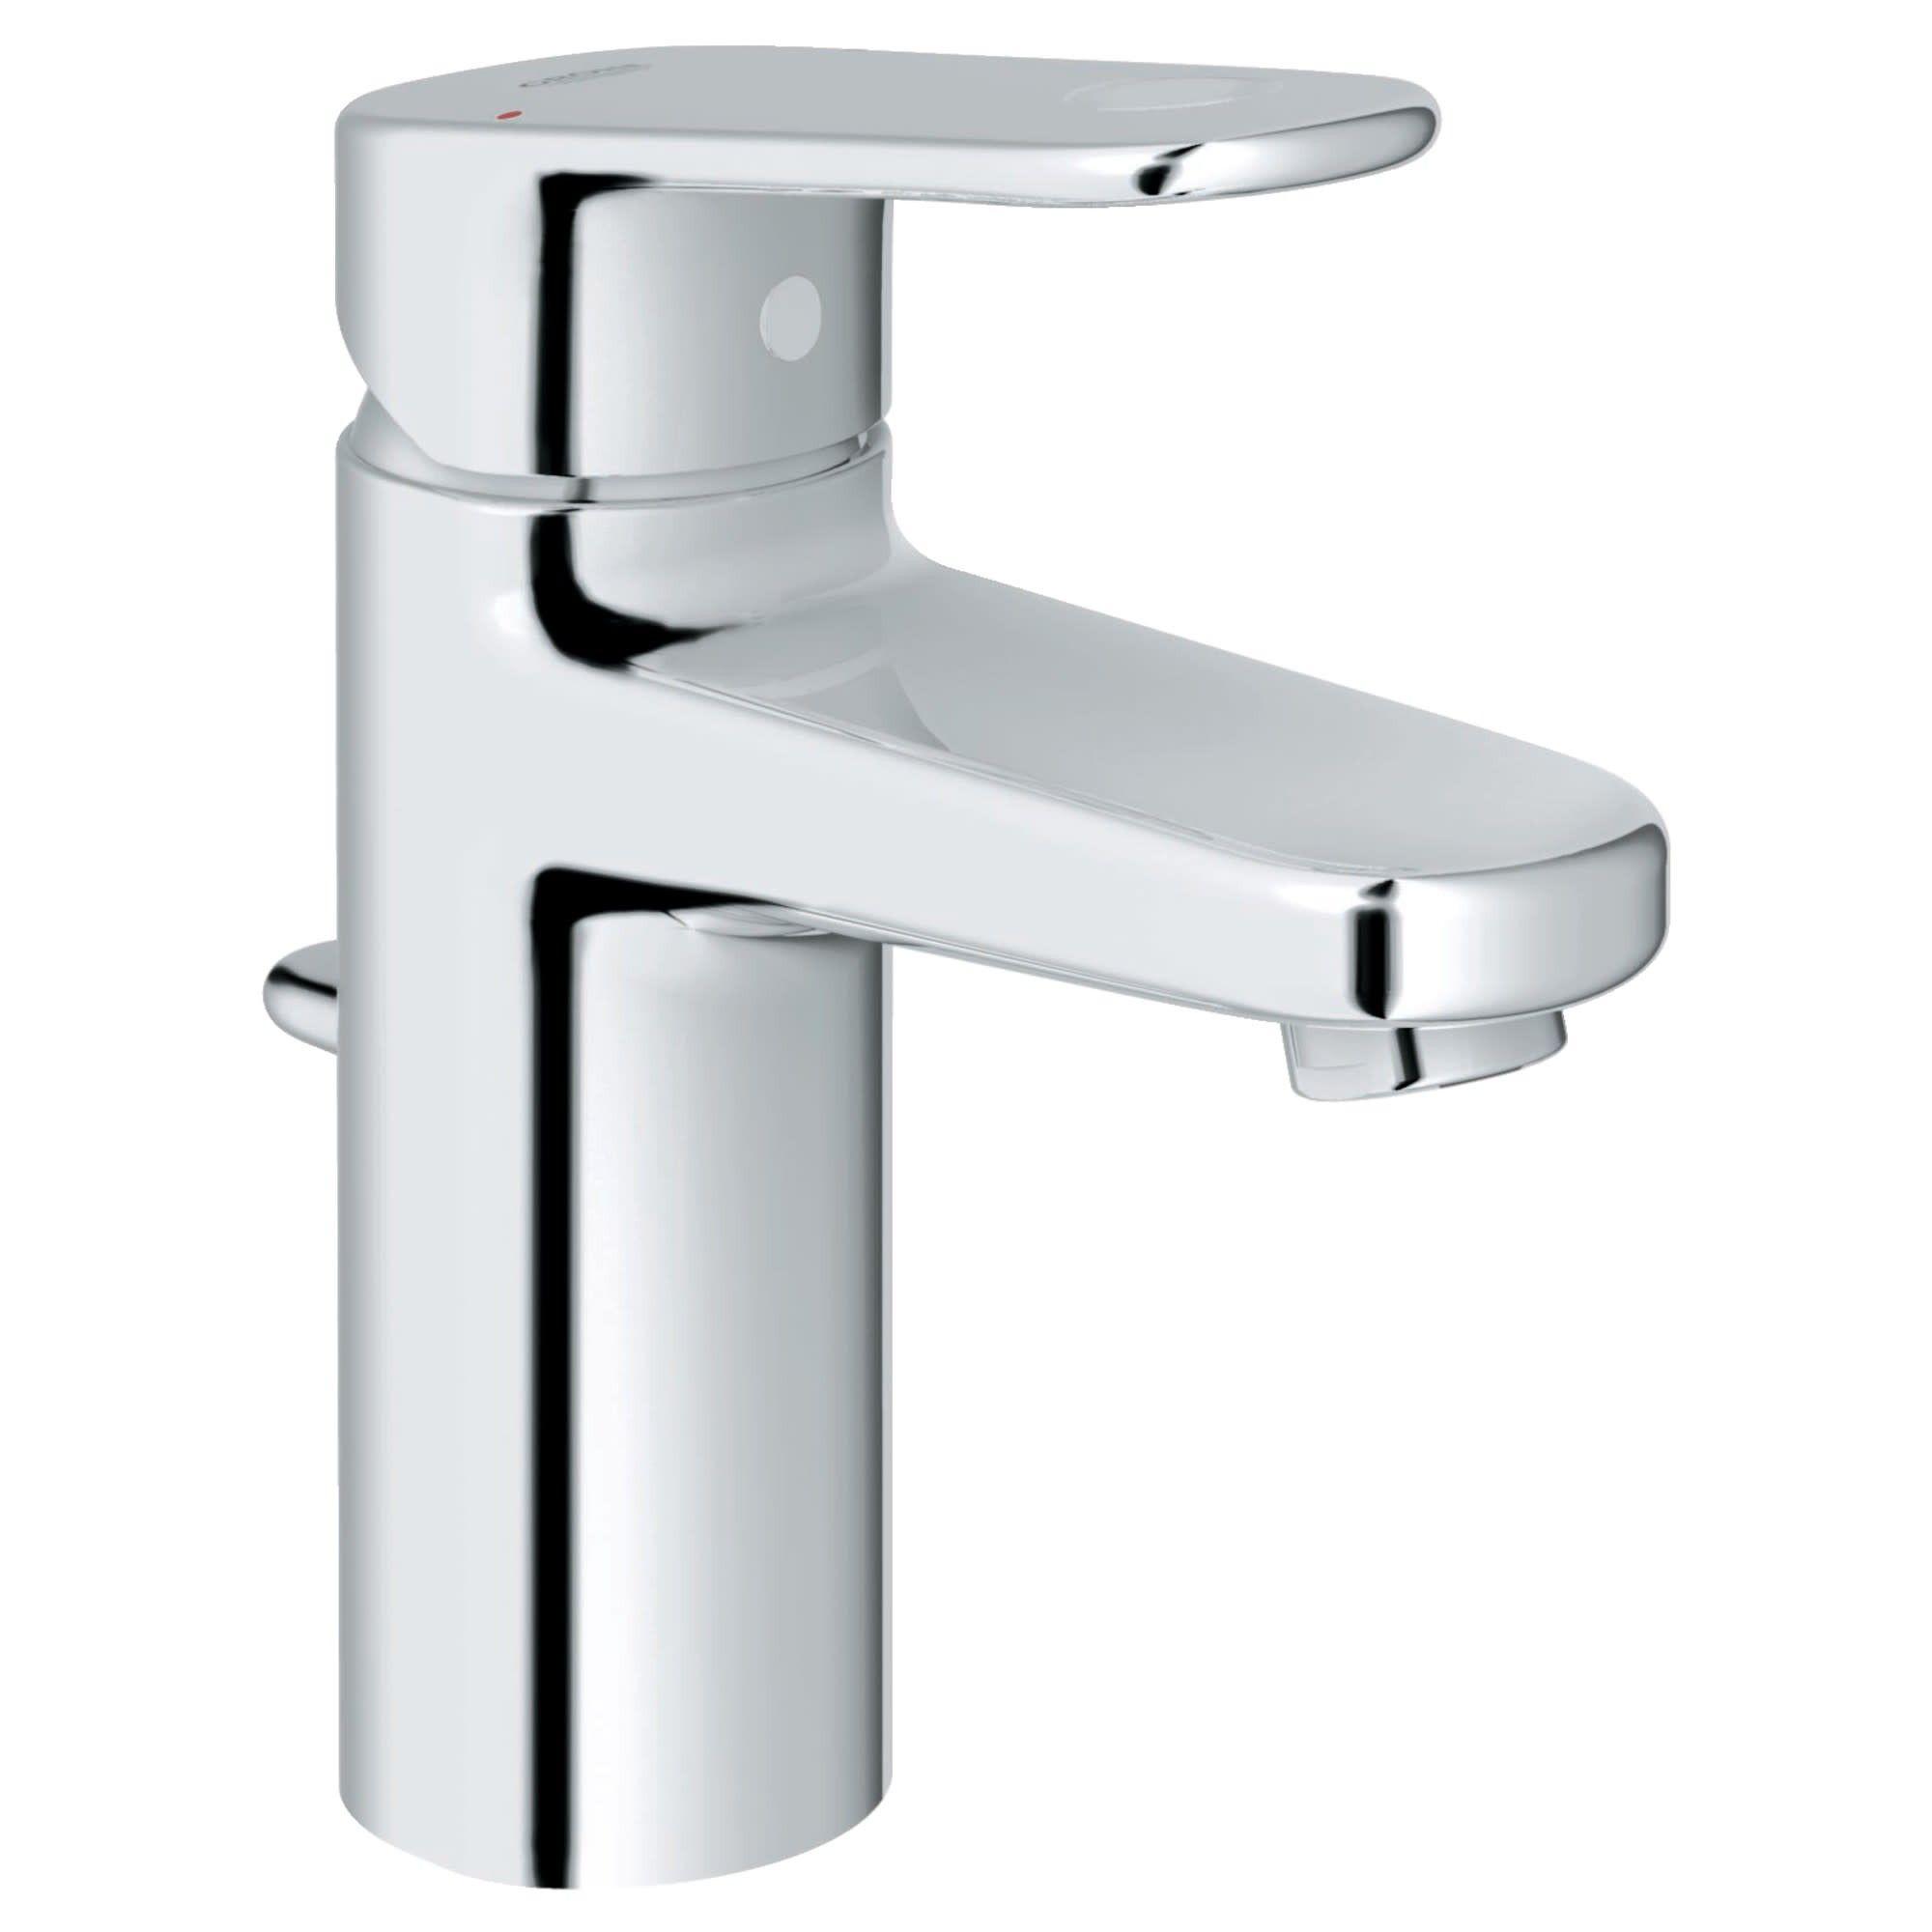 Grohe America Inc 33 170 A Europlus 1 2 Gpm Single Hole Bathroom Faucet Sta Bathroom Faucets Single Handle Bathroom Sink Faucet Single Hole Bathroom Faucet [ 2000 x 2000 Pixel ]